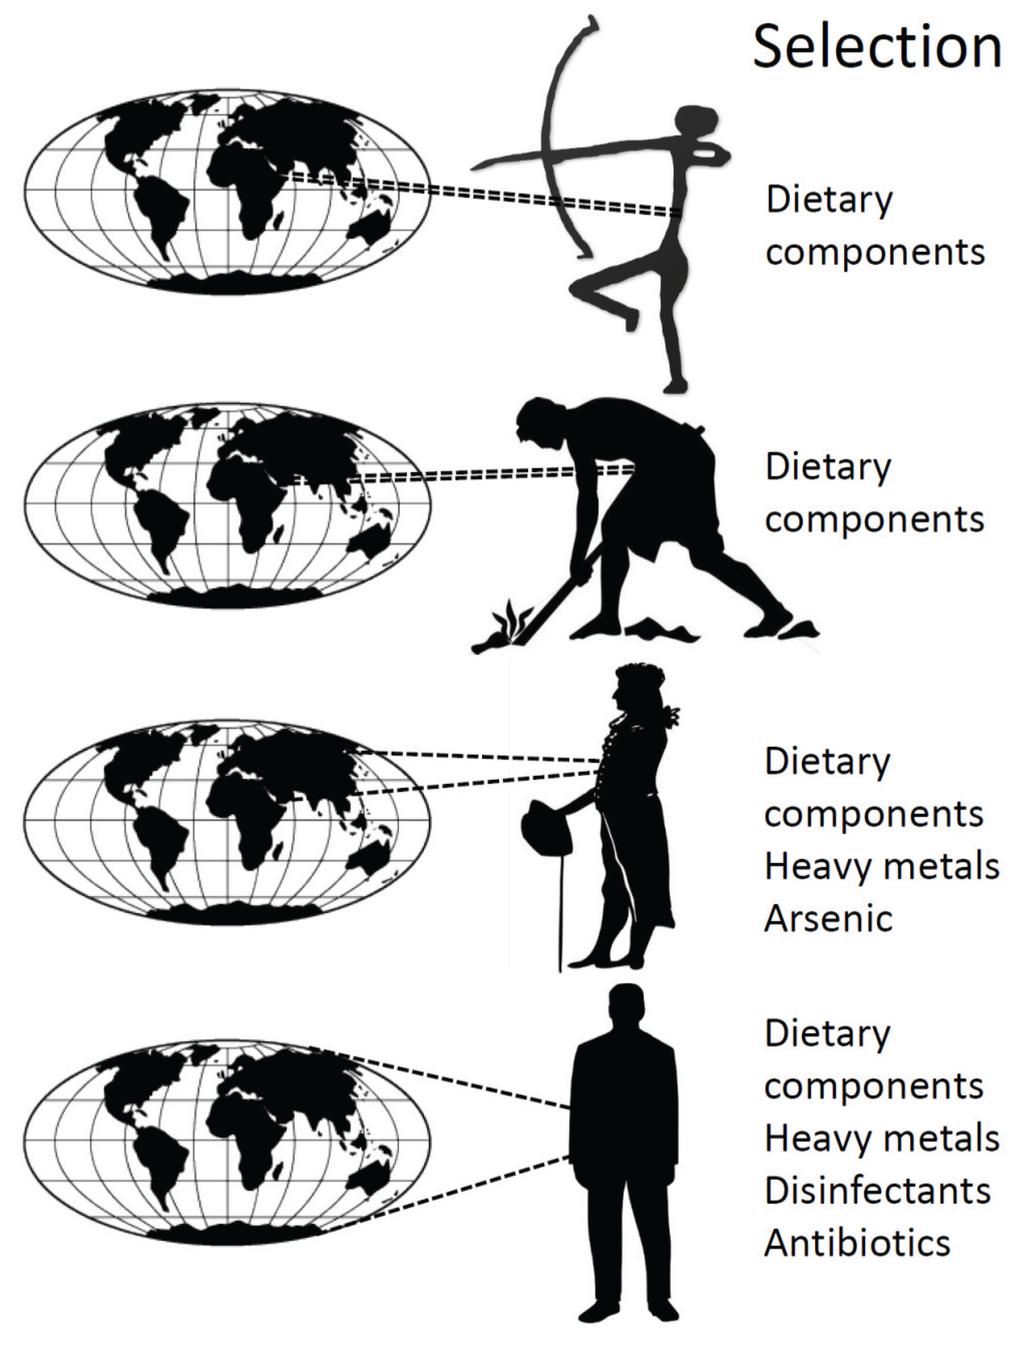 Ecology and Evolution of the Human Microbiota: Fire